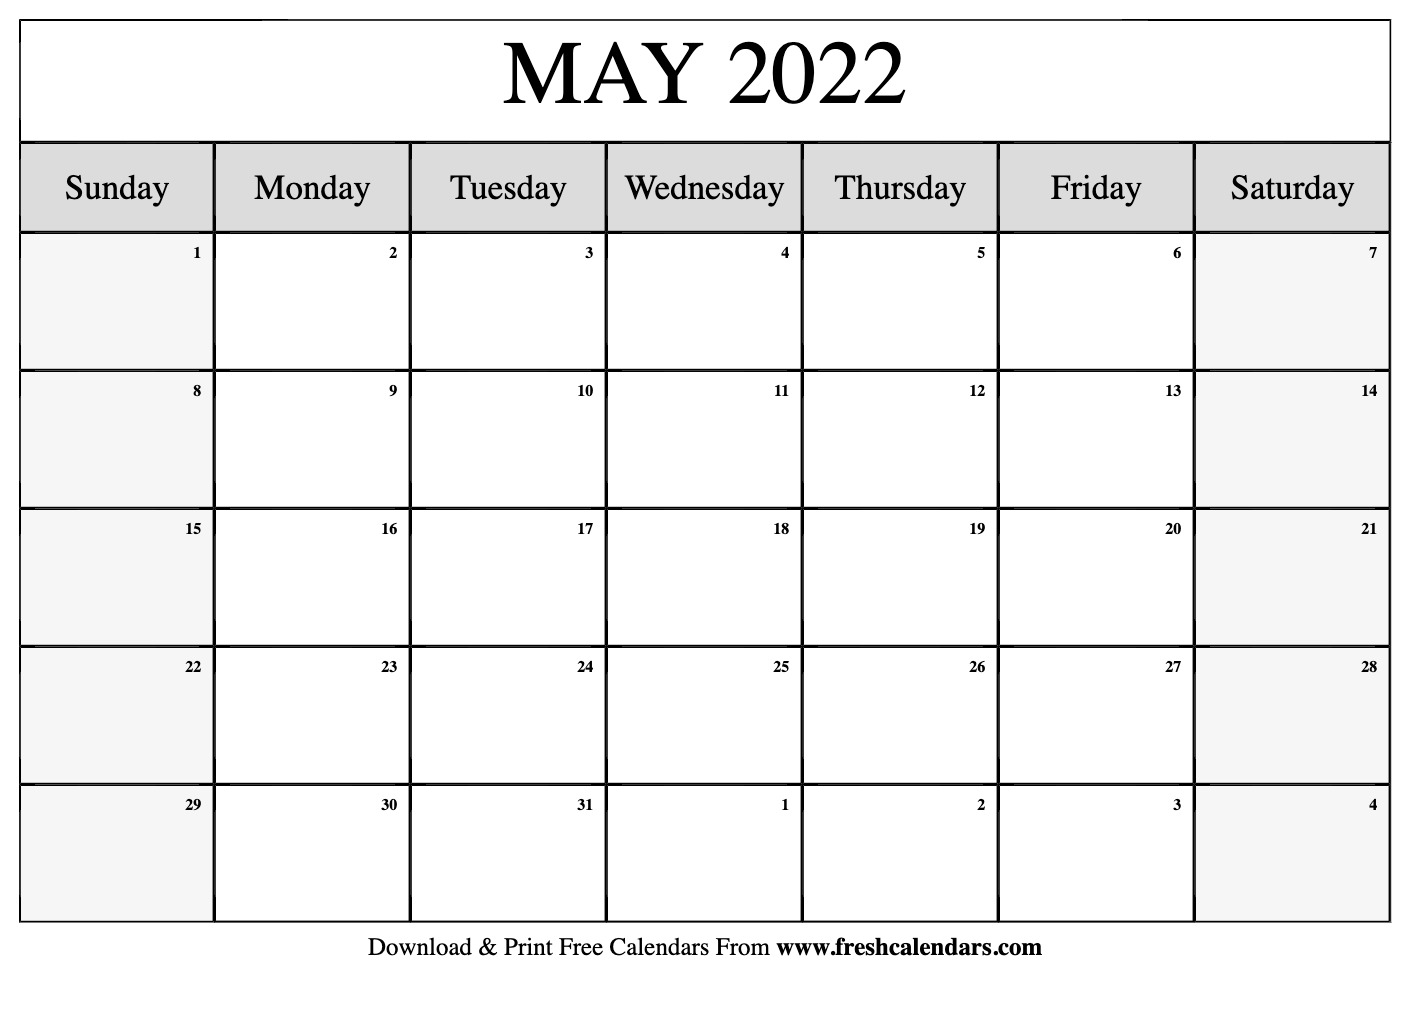 Blank Printable May 2022 Calendars